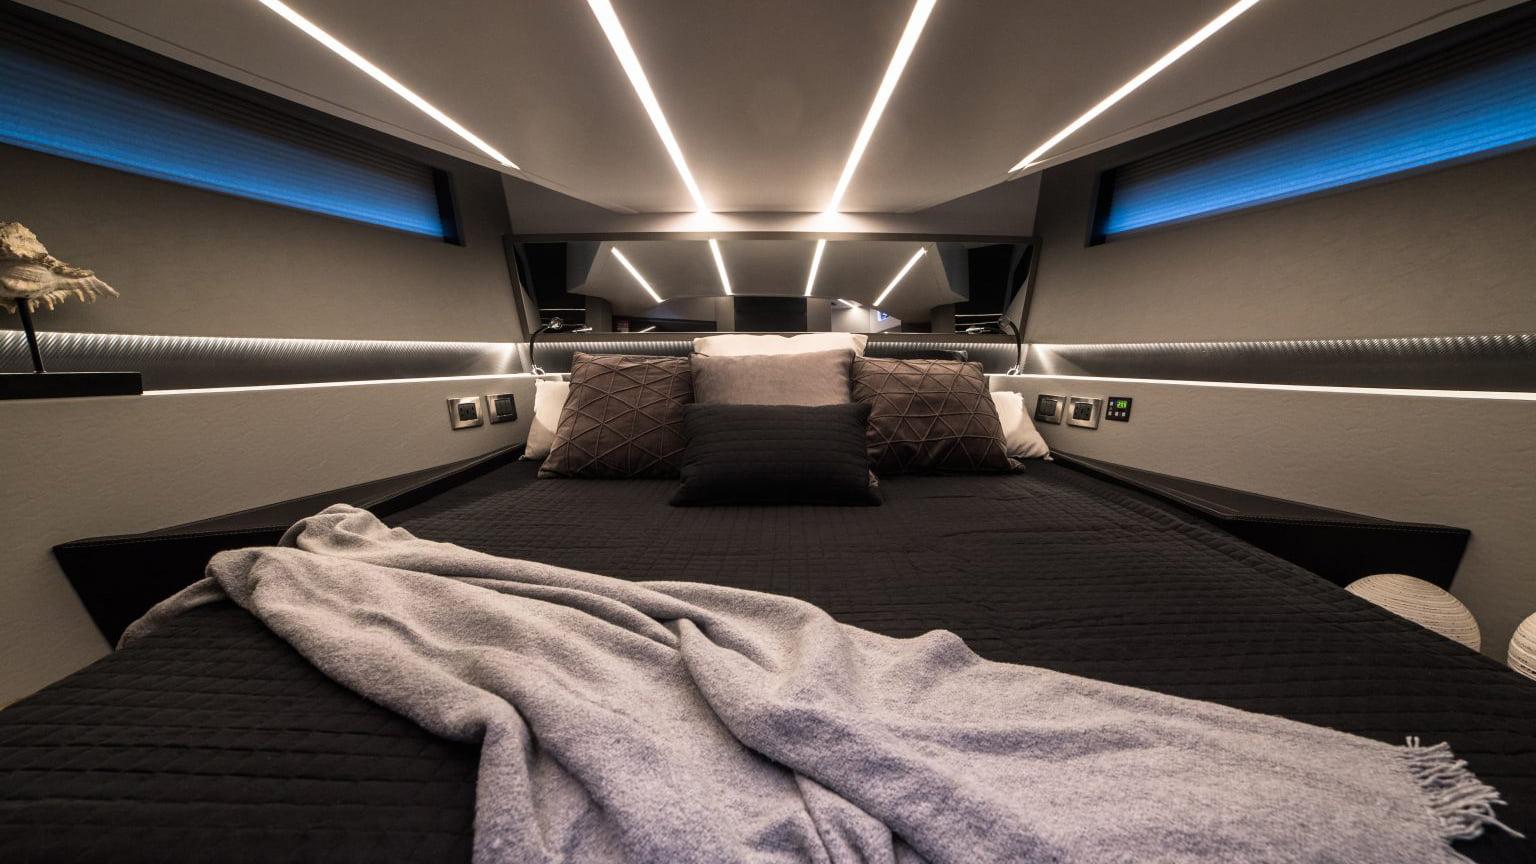 Okean 55 sport-ht - interiores (10)